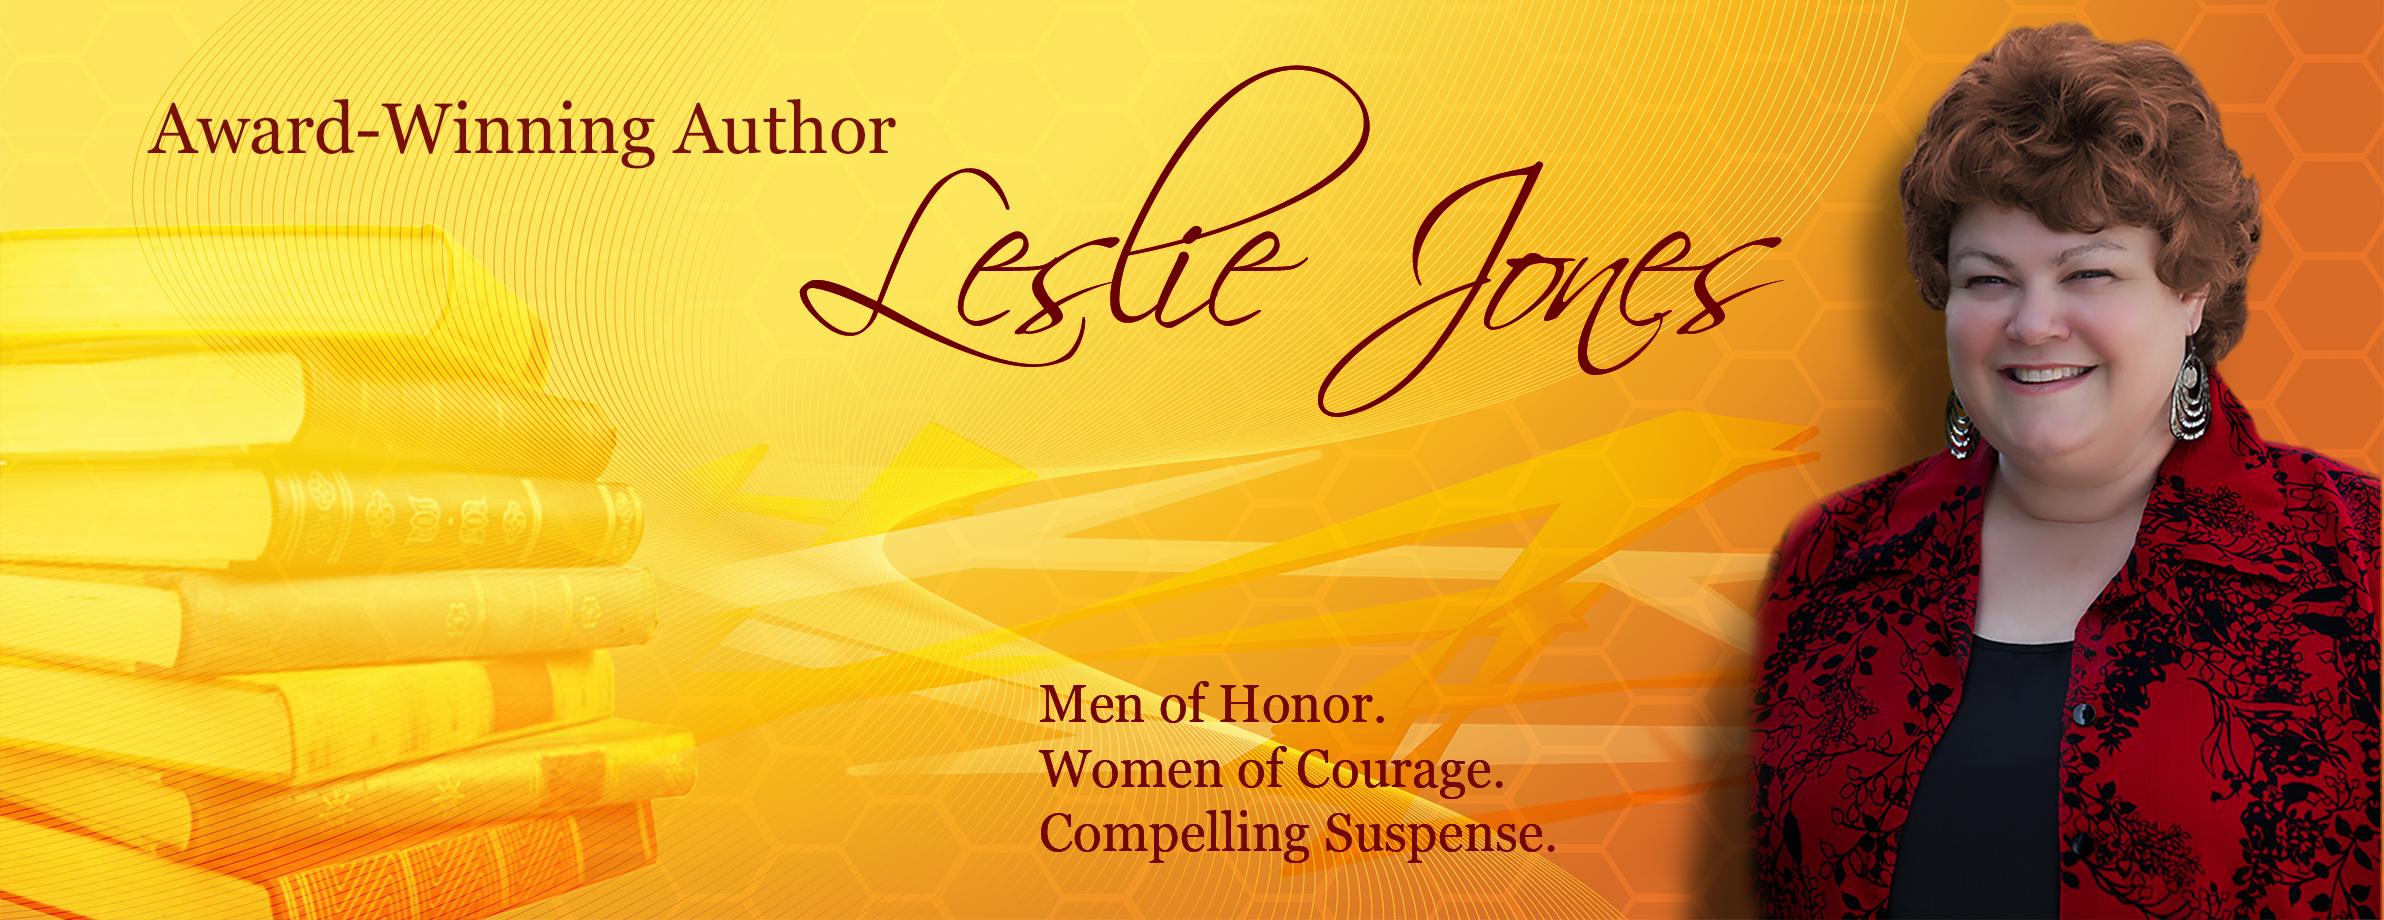 www.lesliejonesbooks.com